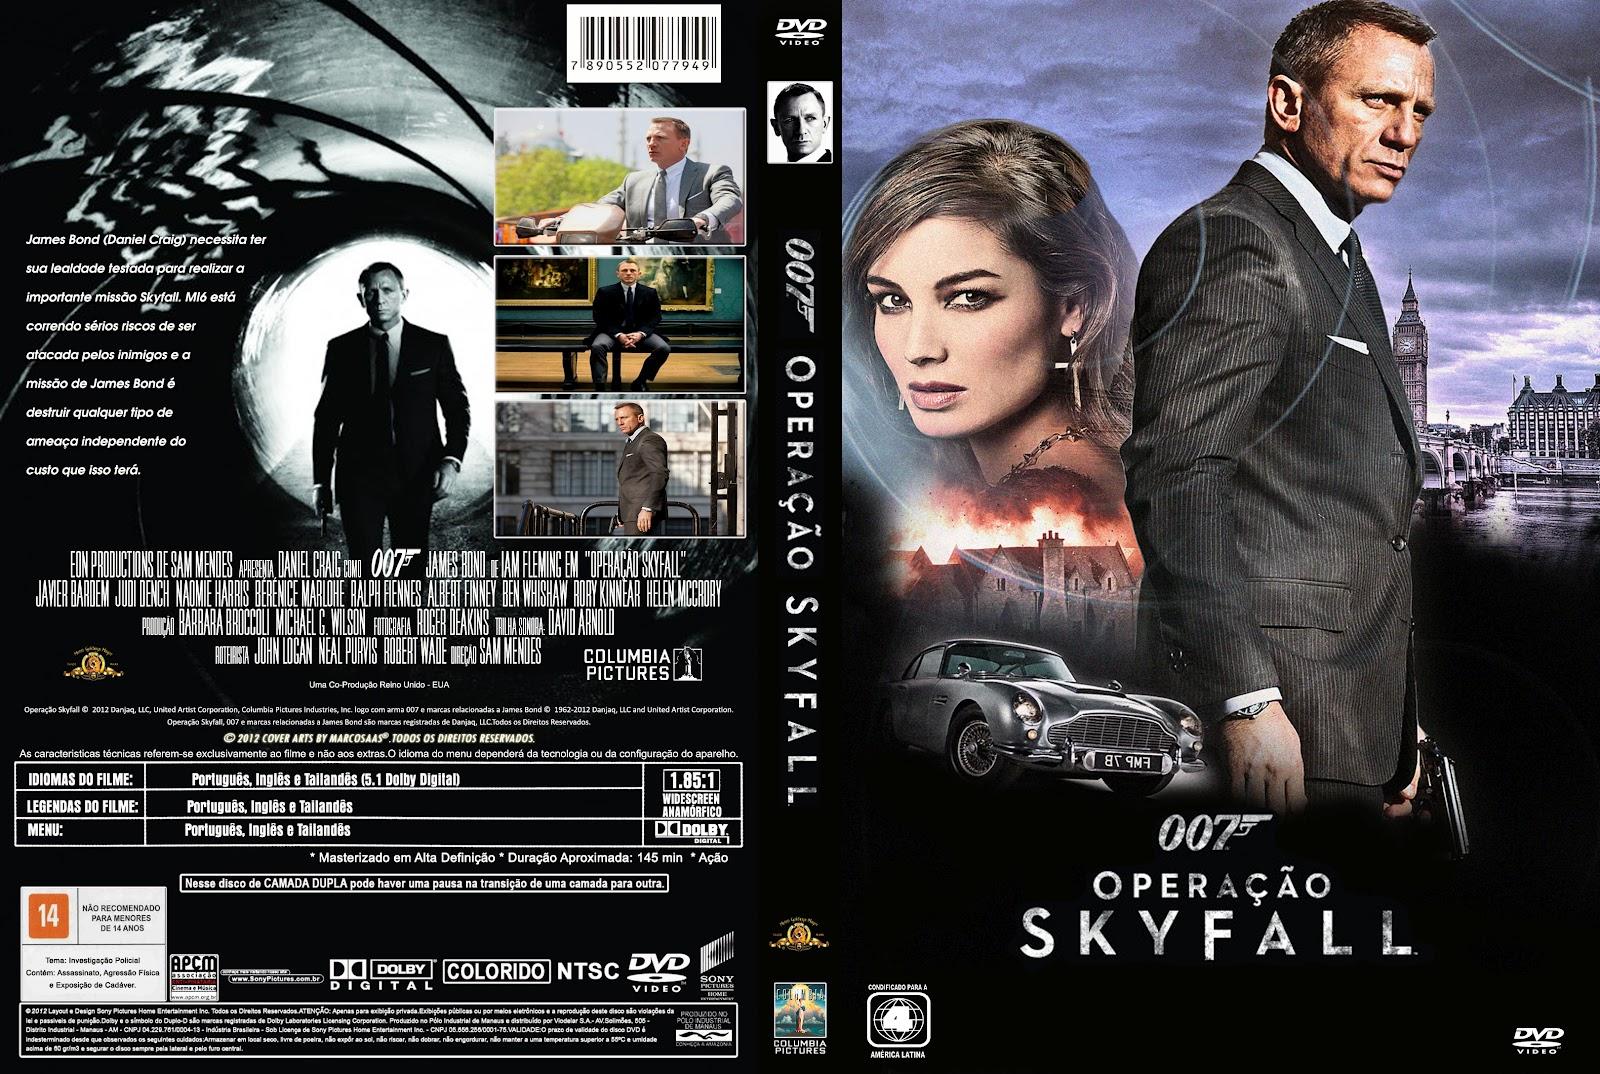 007 Skyfall DVD-...007 Skyfall Dvd Cover